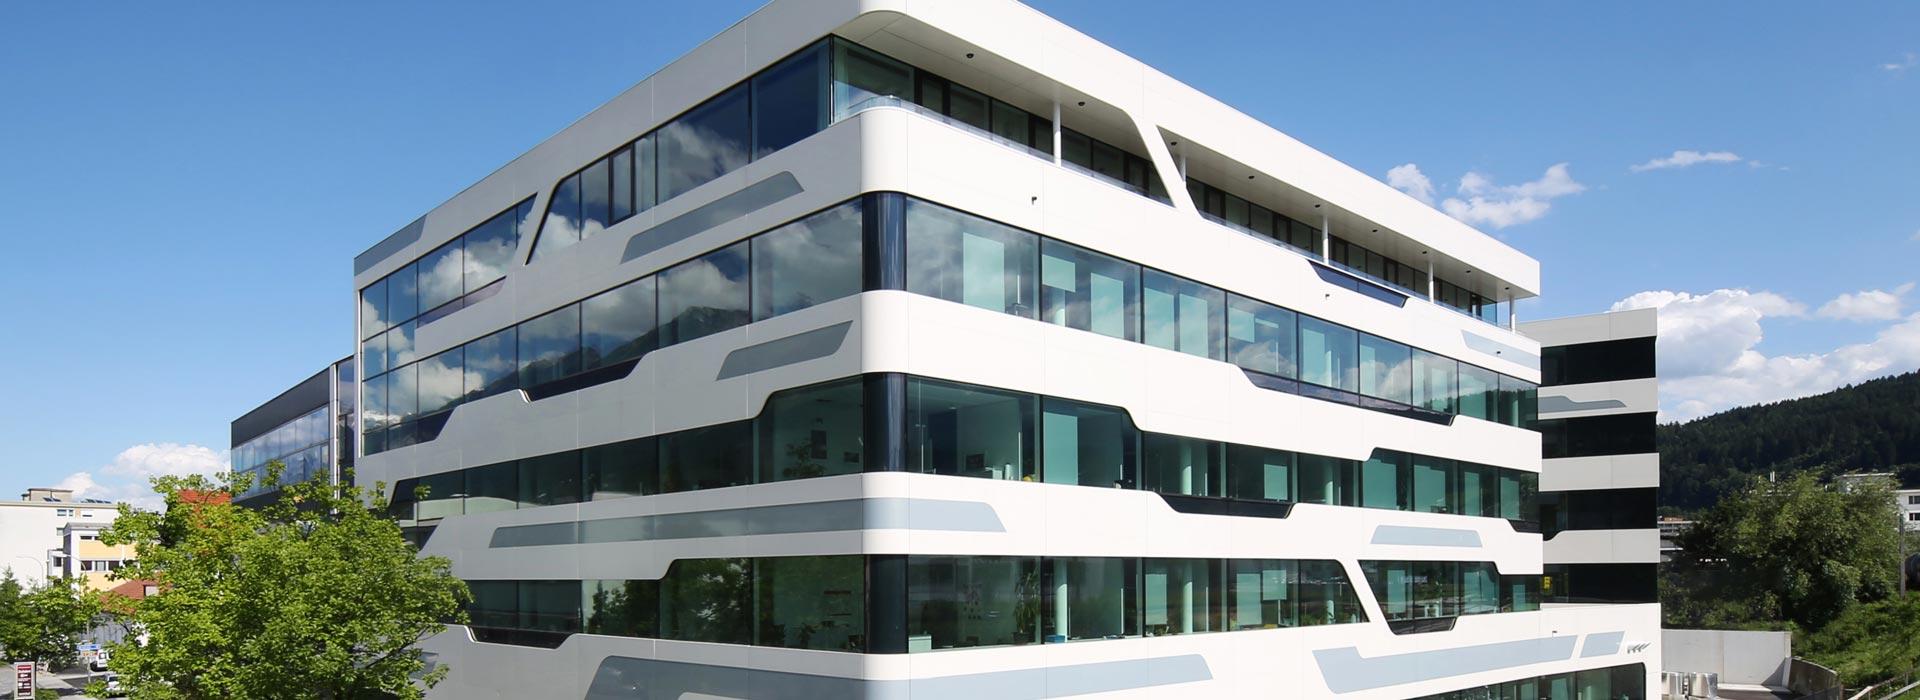 med-el-building